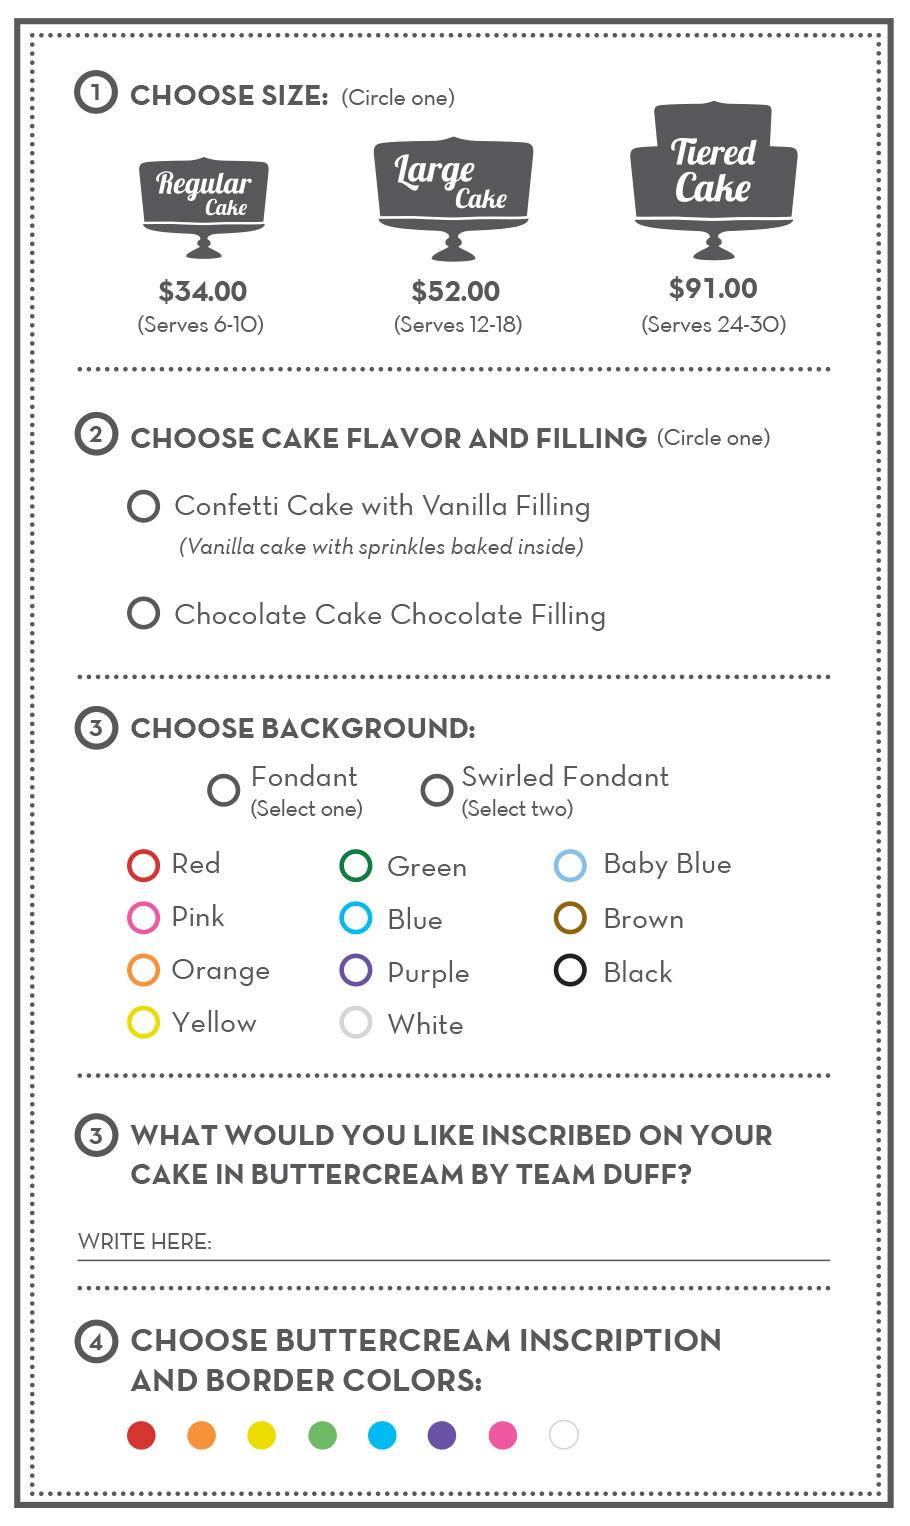 Duff\'s Cakemix   A Do It Yourself Cake & Cupcake Decorating Studio